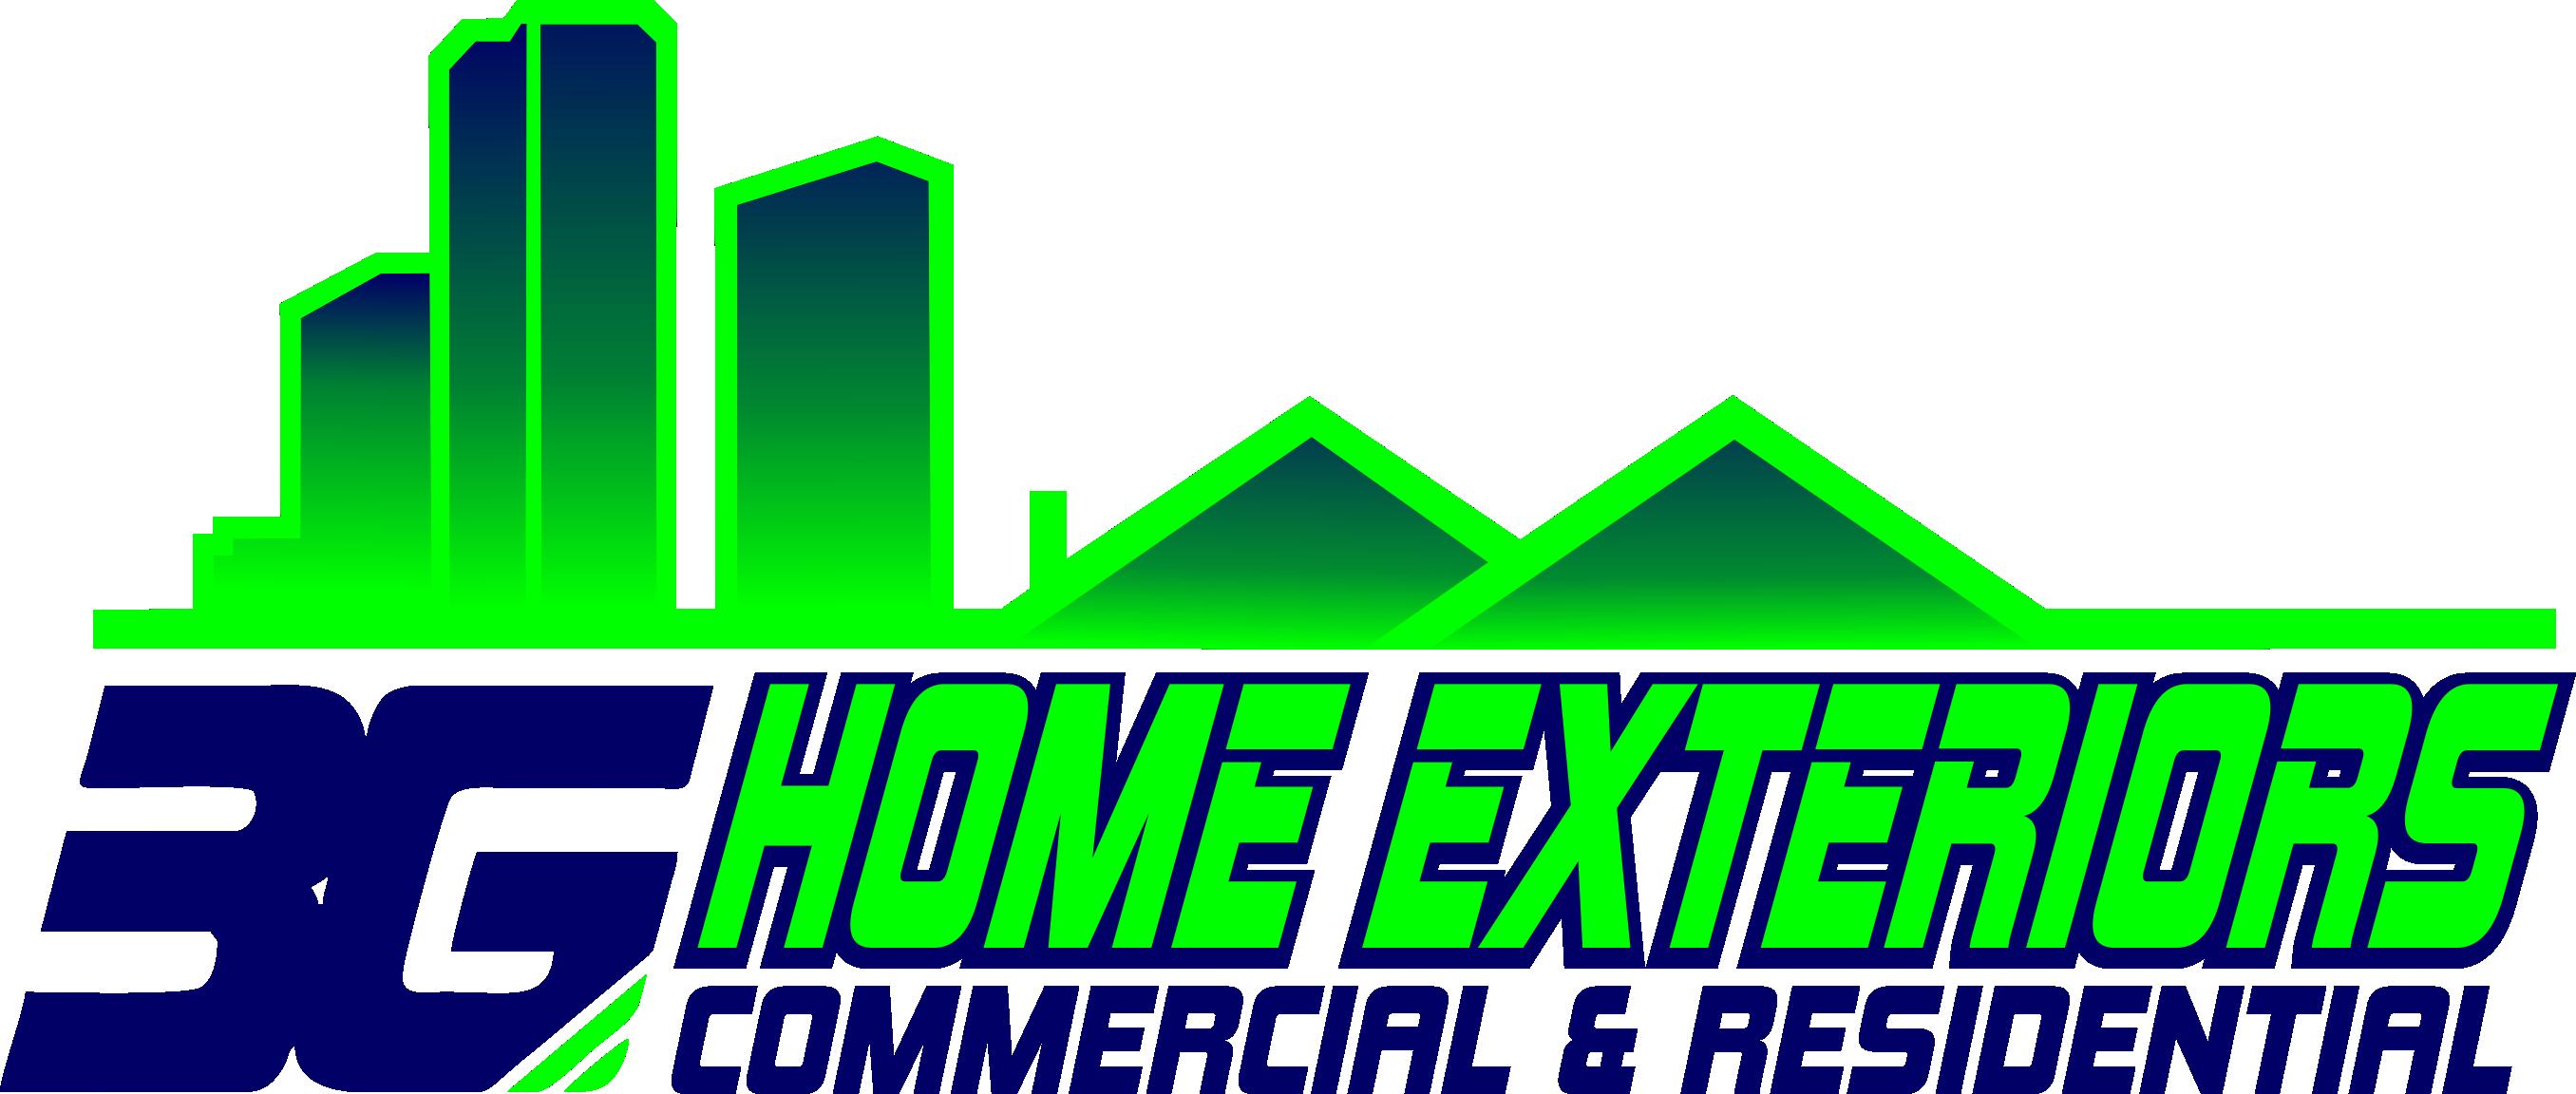 3G Home Exteriors - Florida